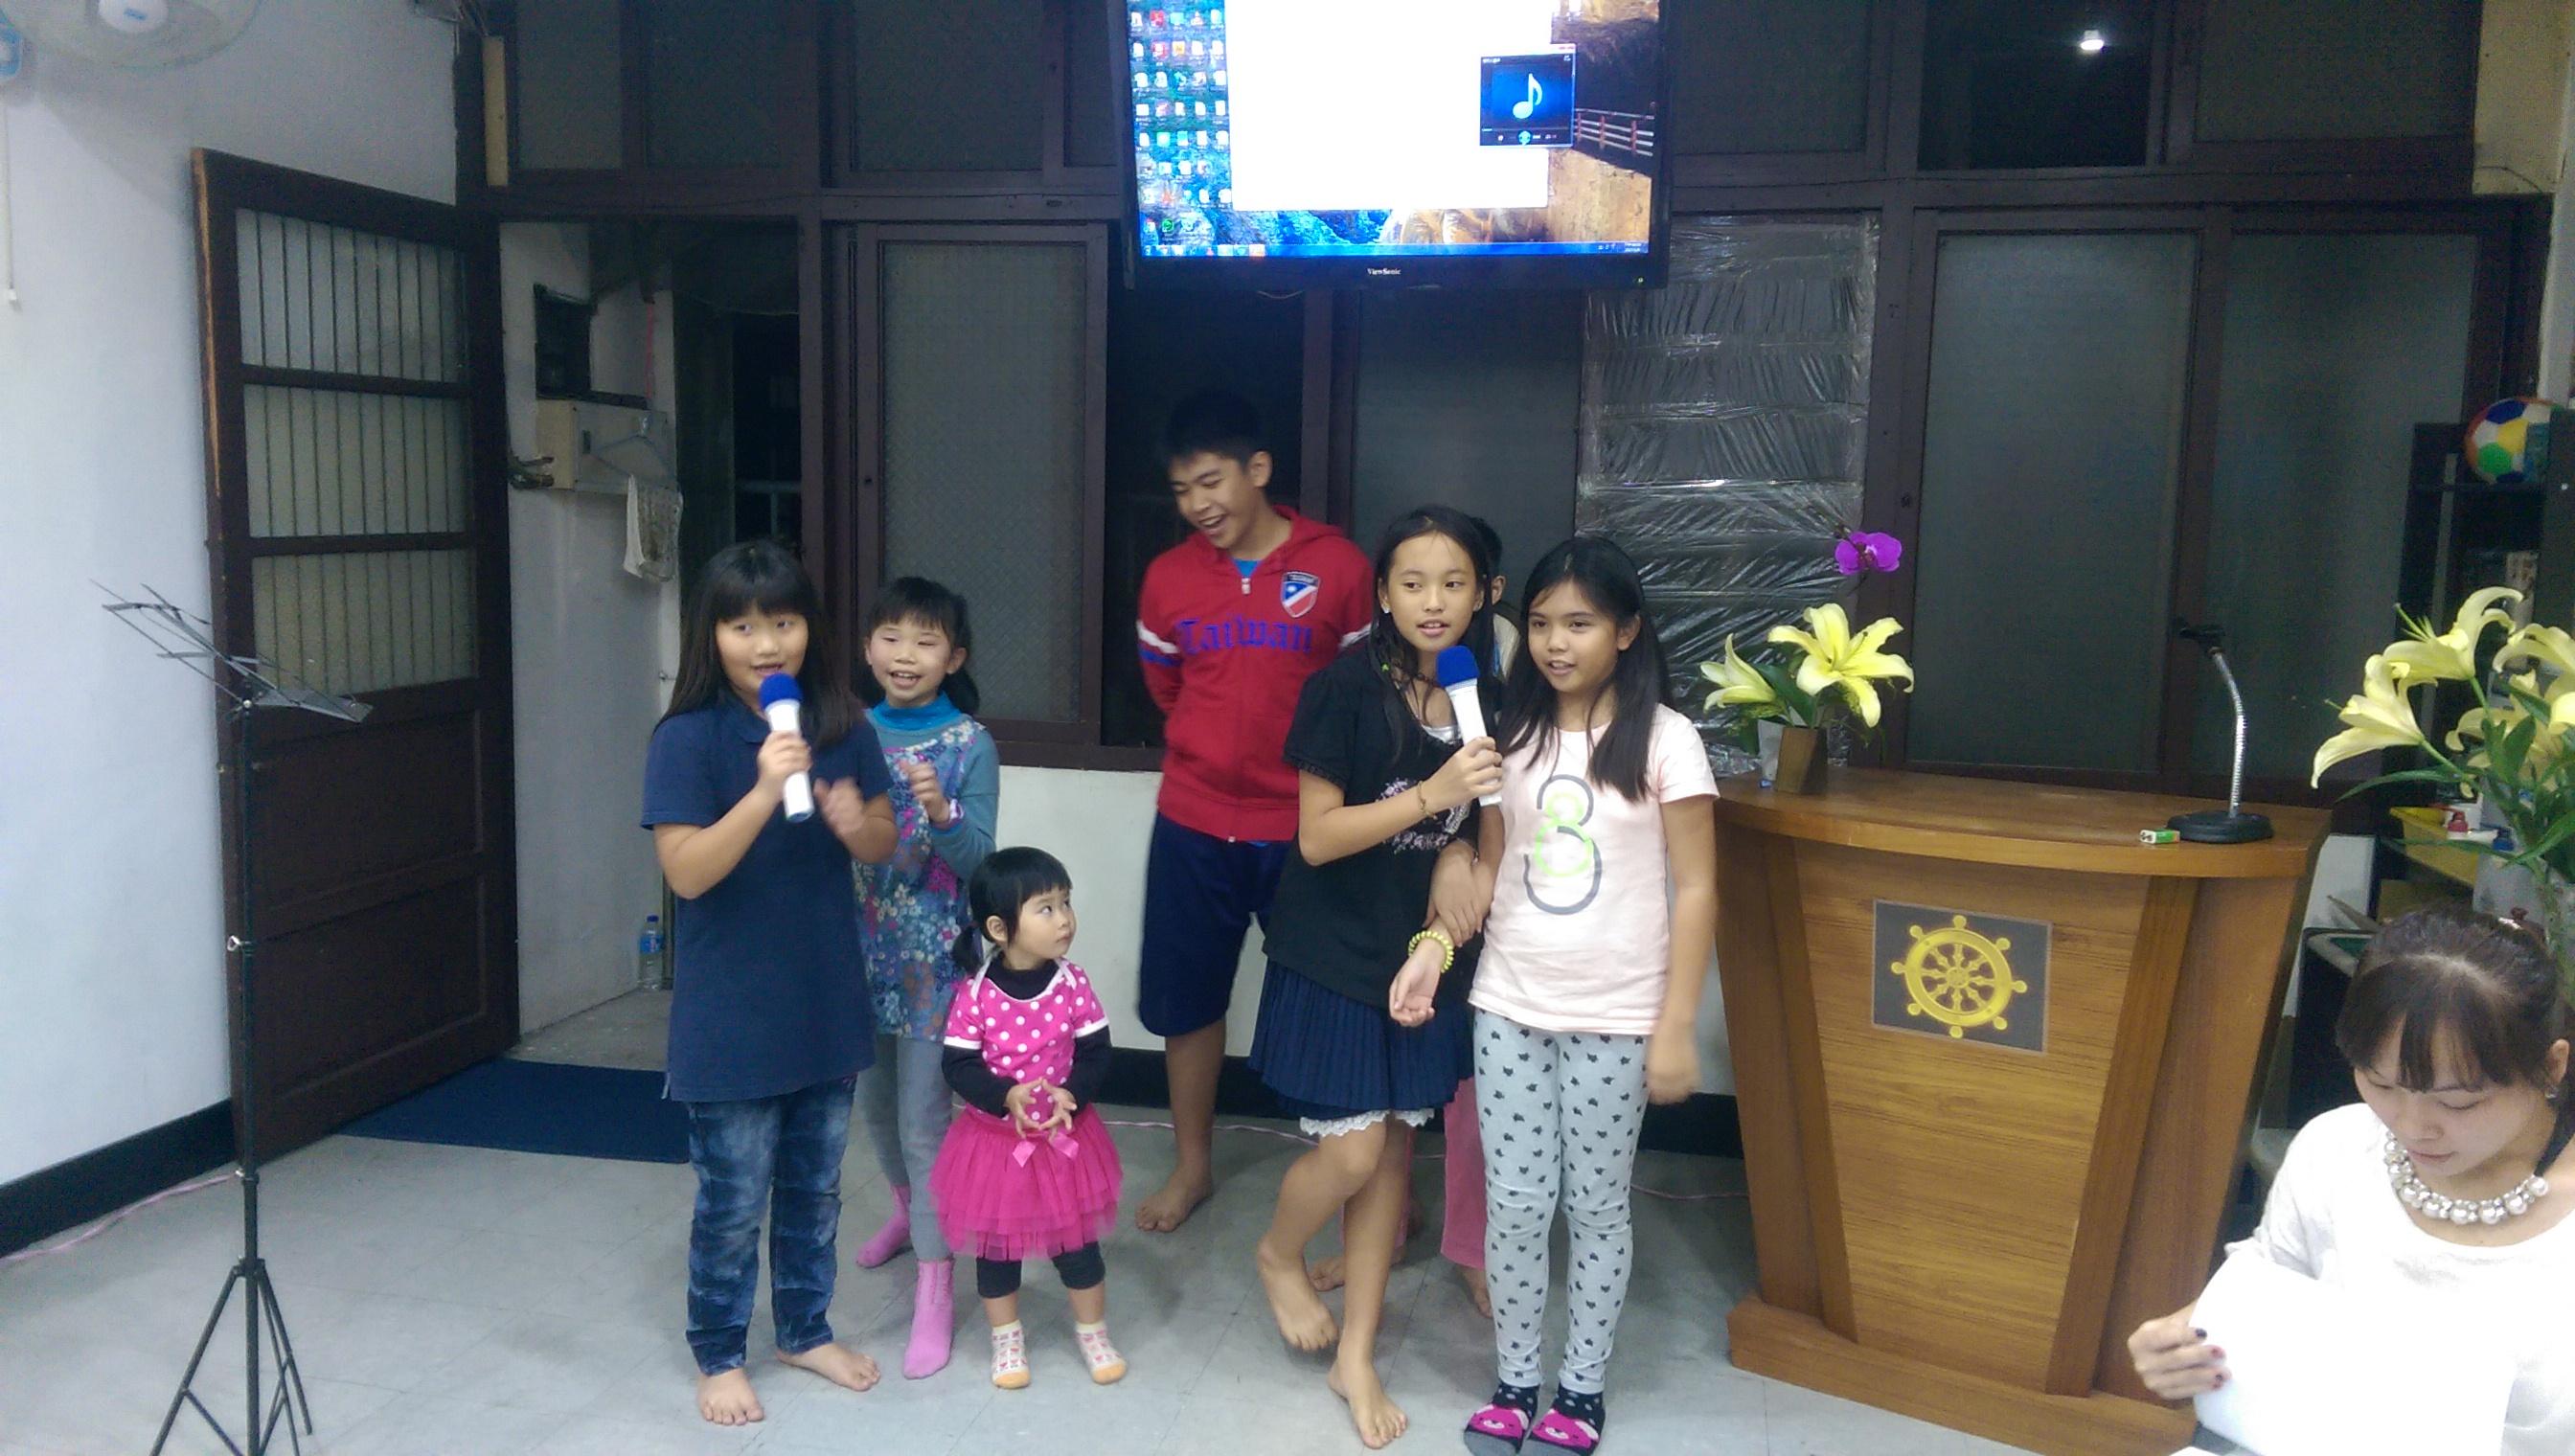 IMAG0381